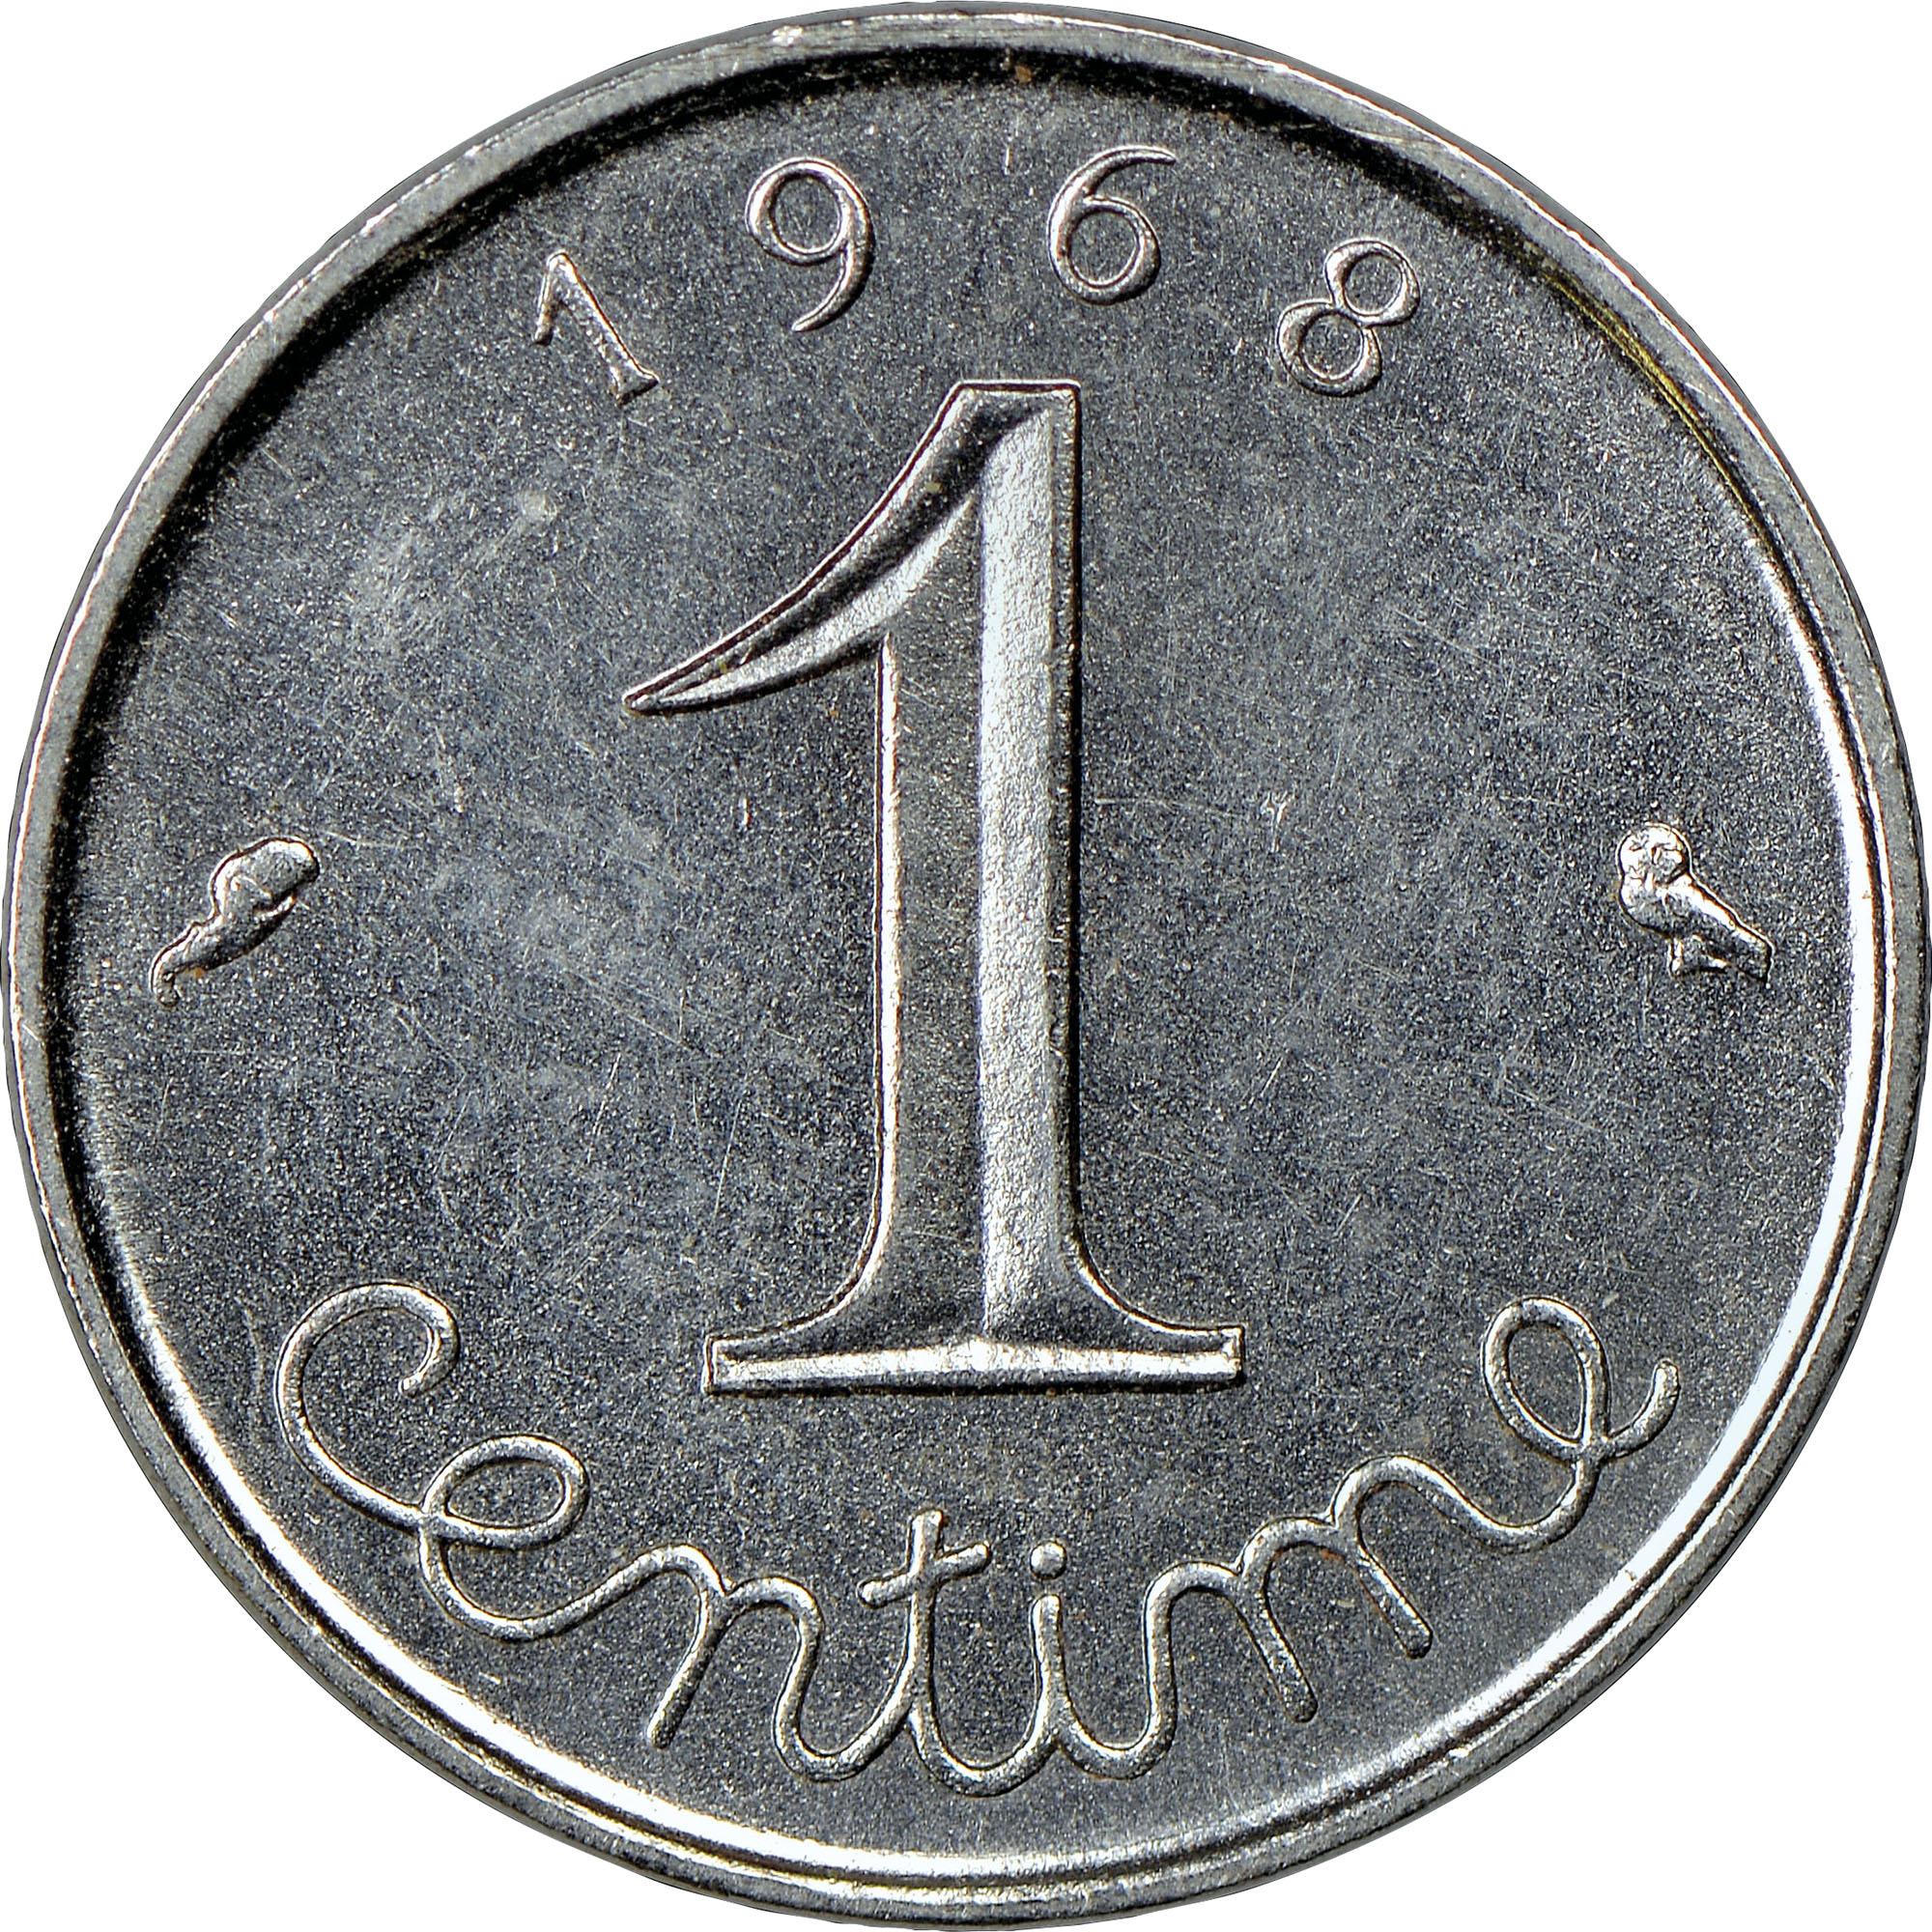 France Centime reverse